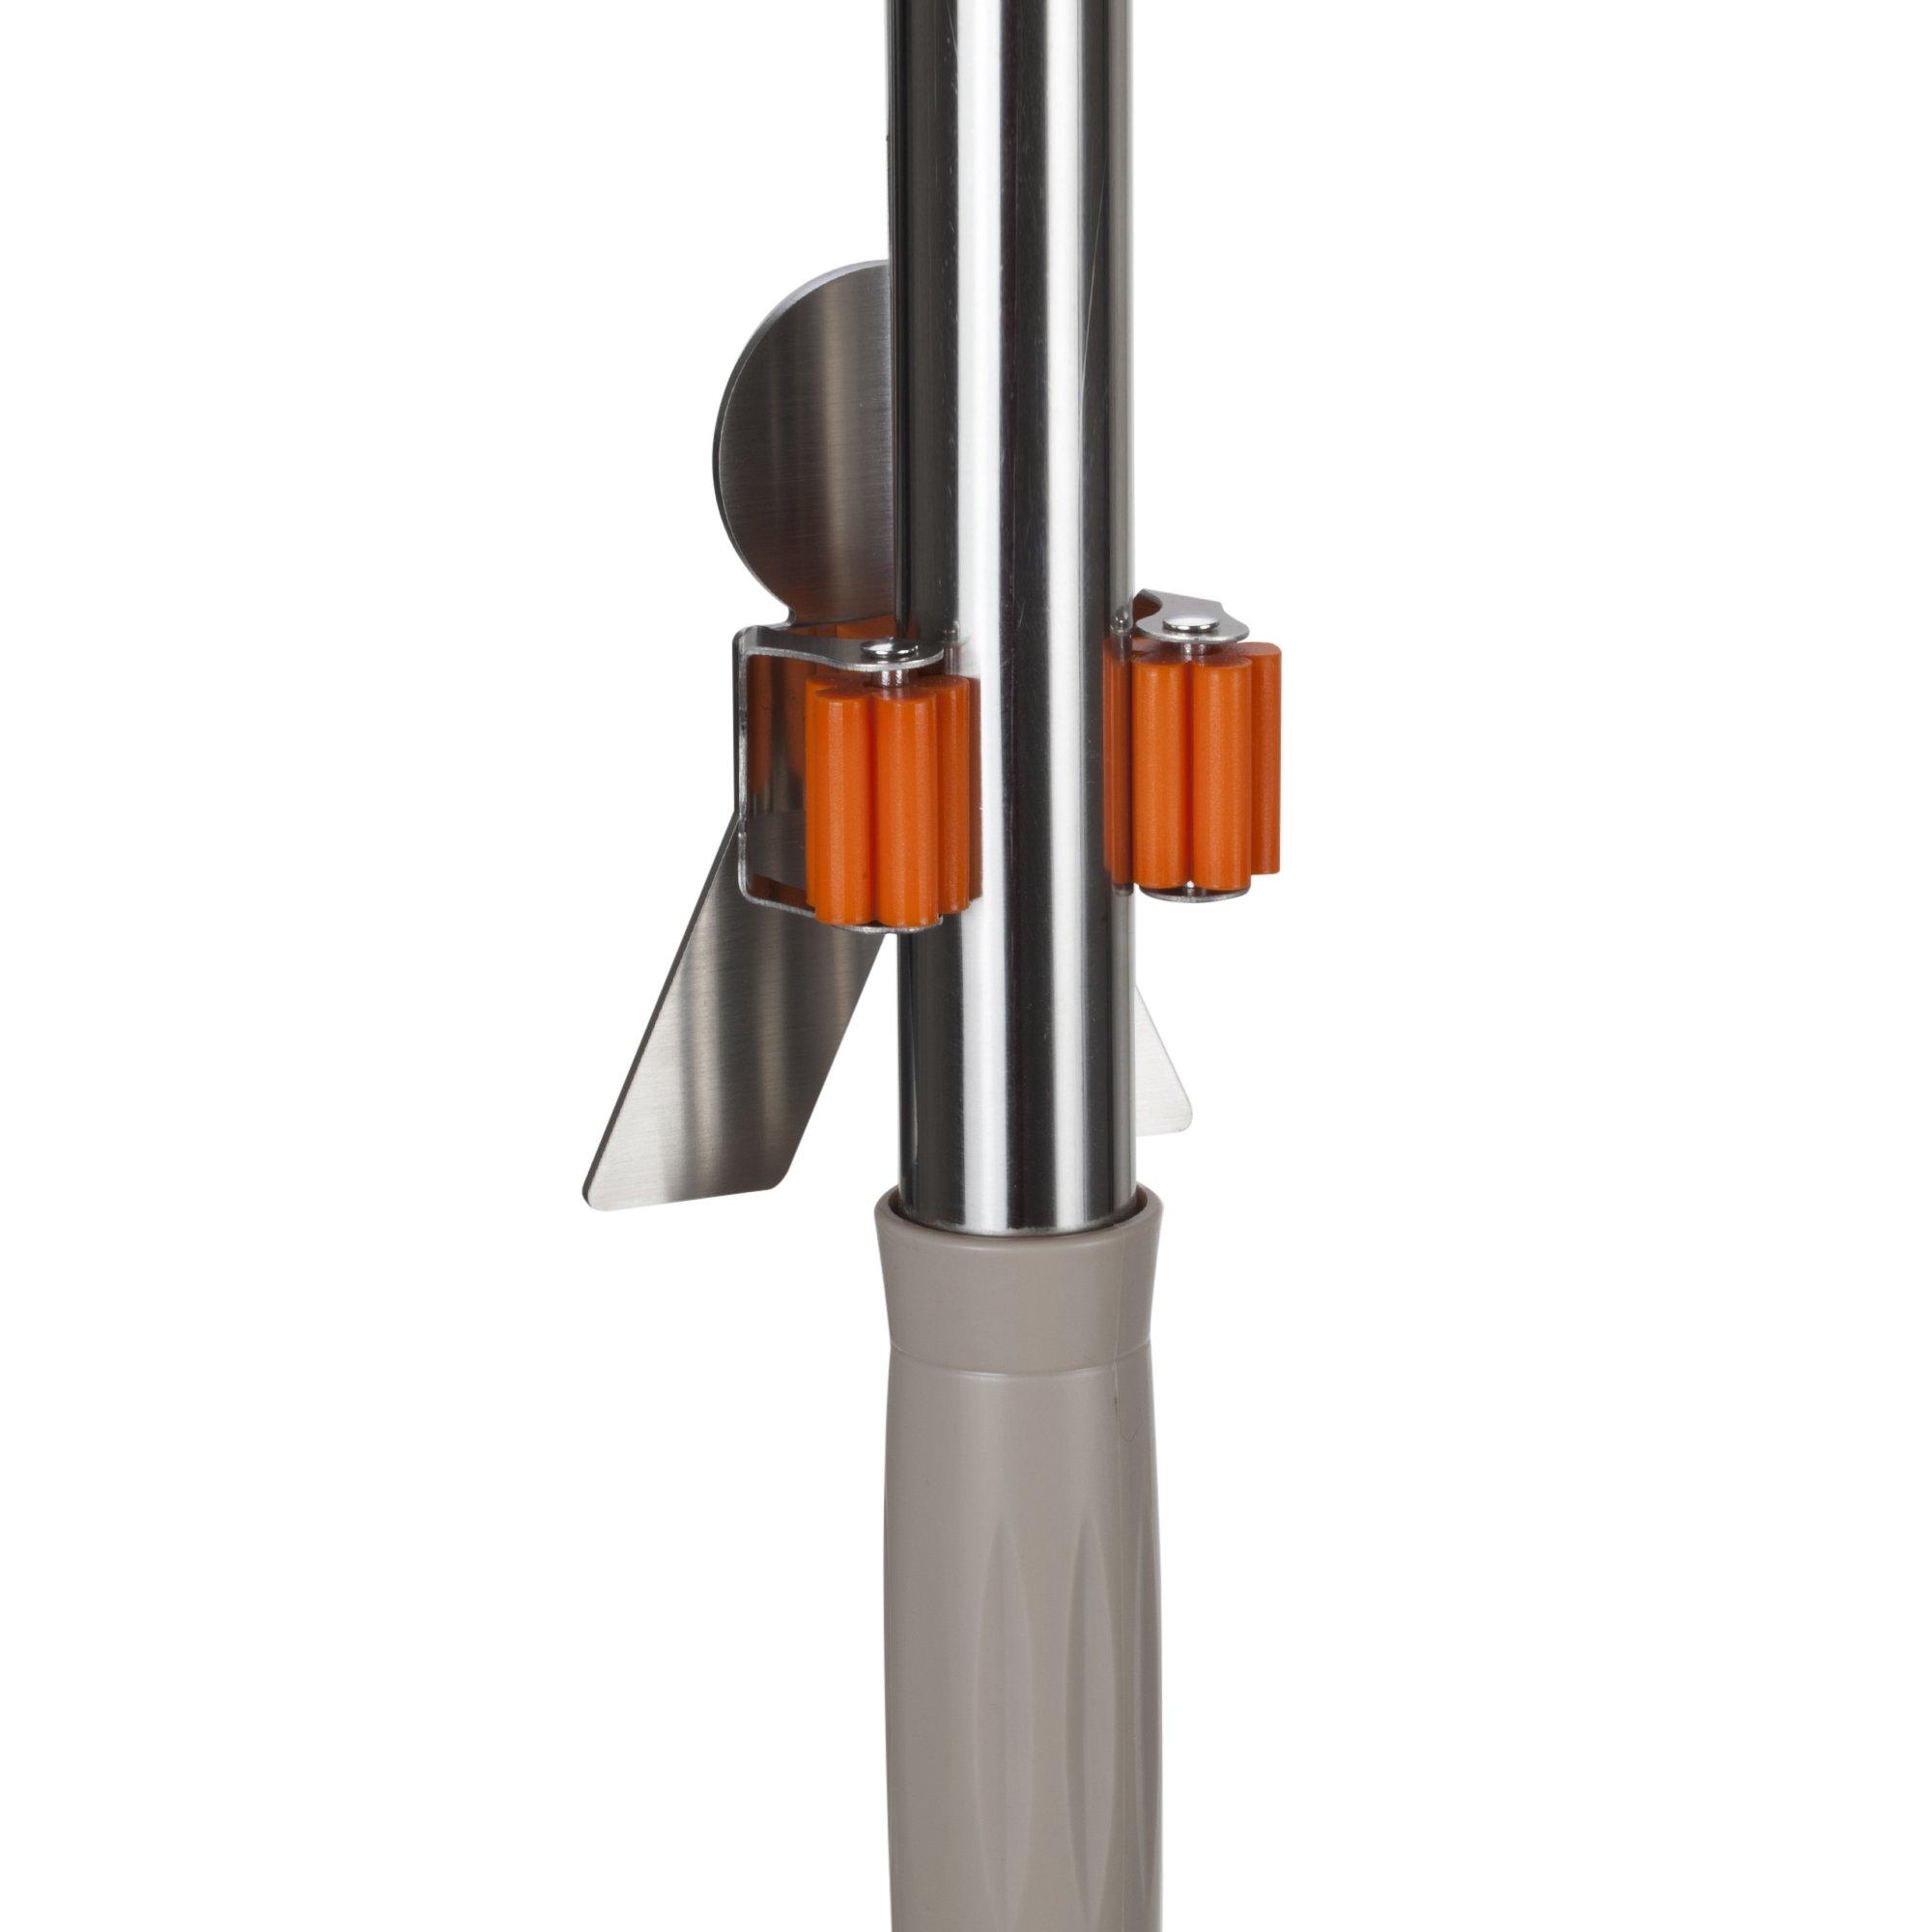 Bosszi SUS304 Stainless Steel Mop Broom Holder Racks Adhesive Wall Mount Bathroom Storage Organizer Mop Hanger (2 Pack) by Bosszi (Image #4)